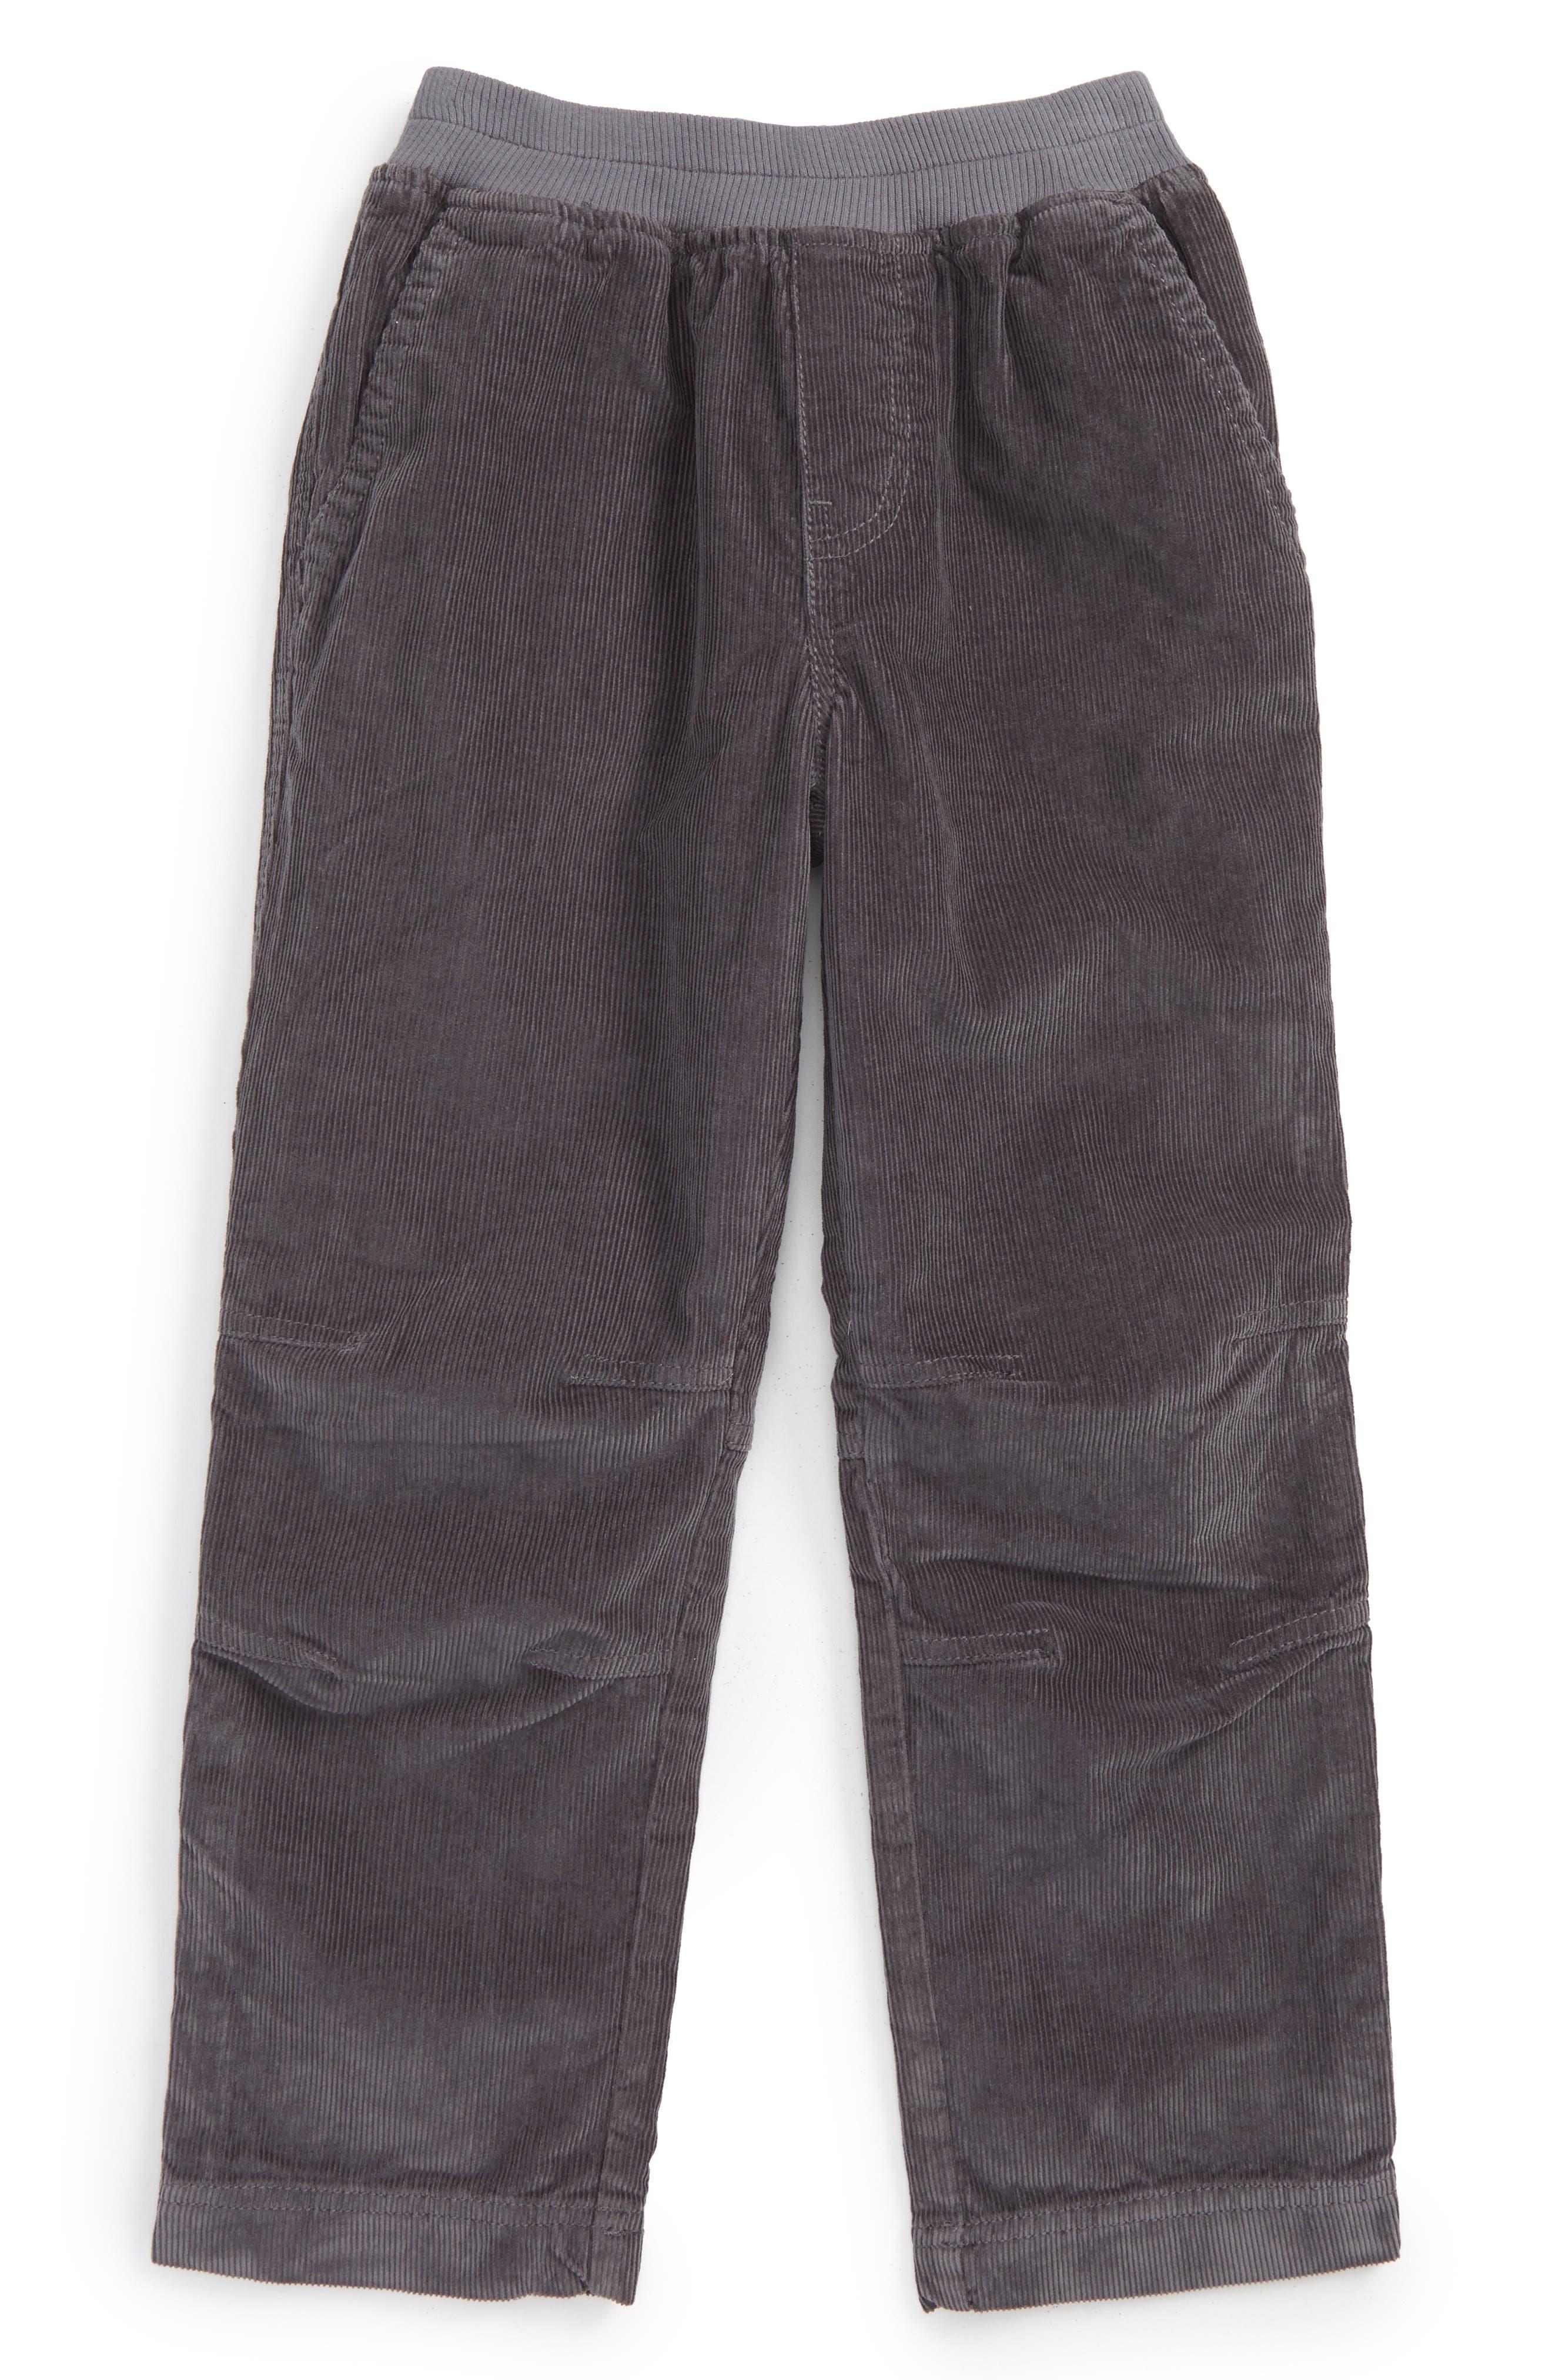 Tea Collection Corduroy Pants (Toddler Boys & Little Boys)